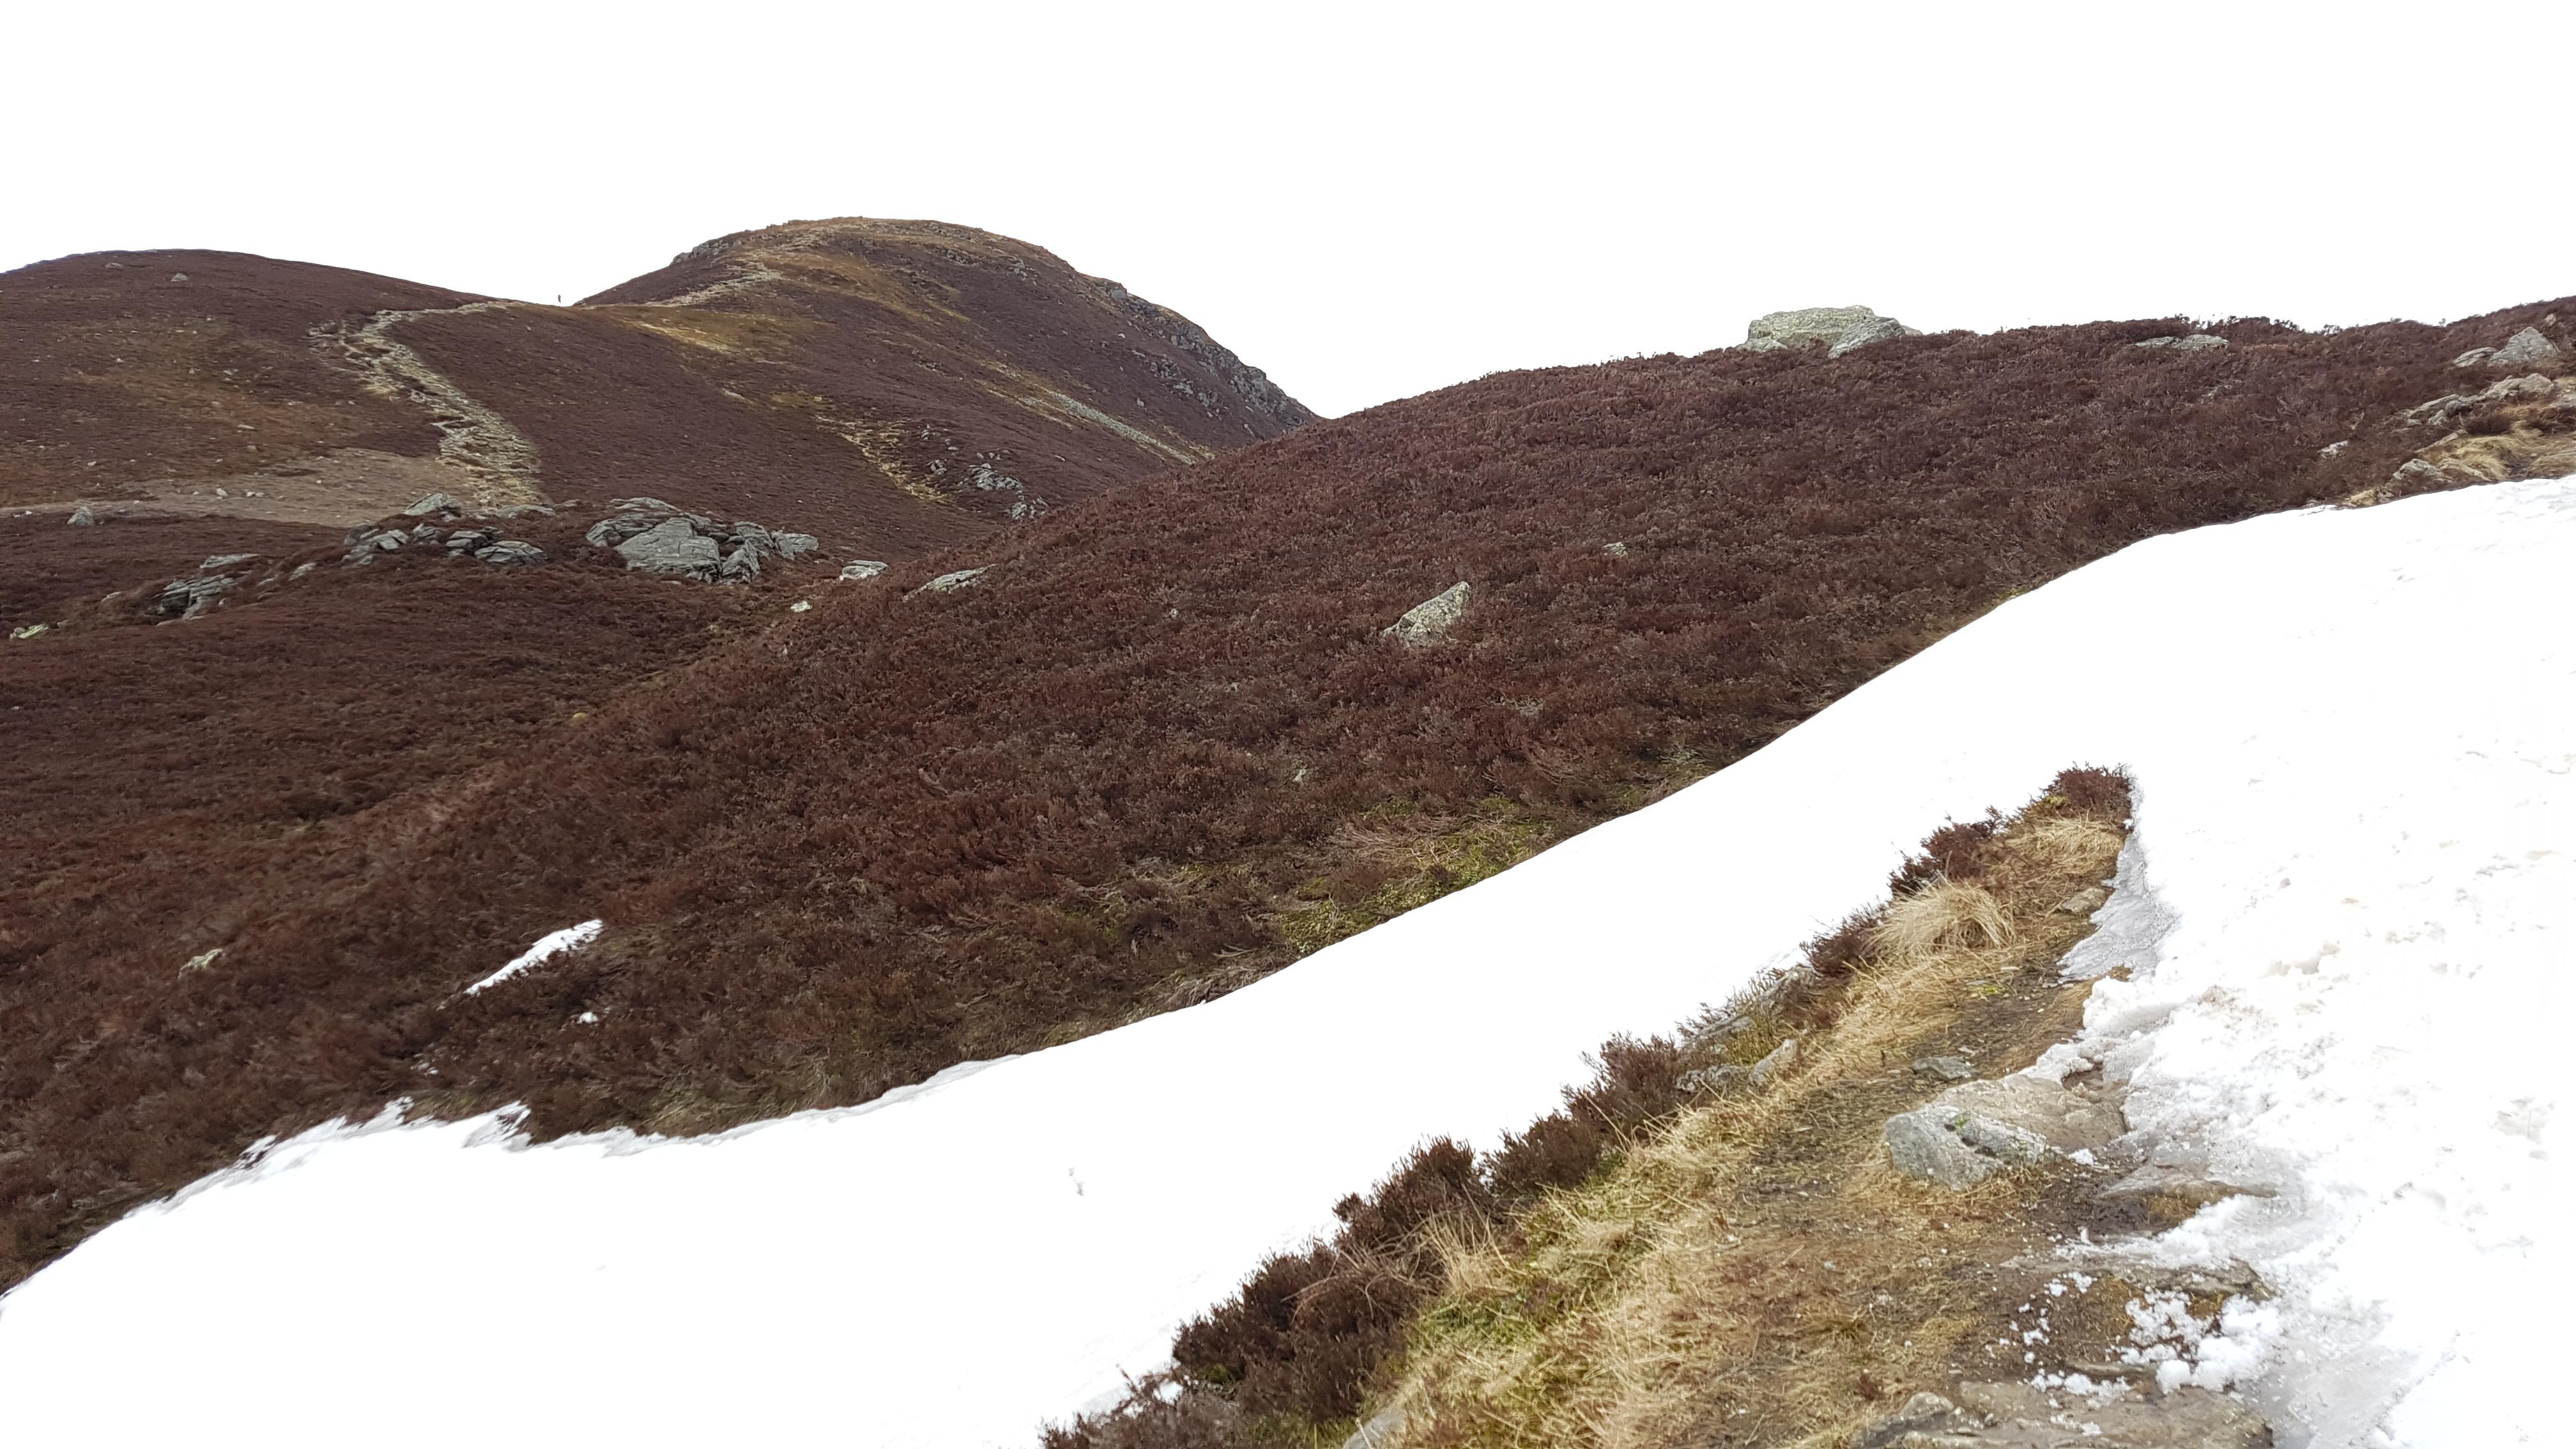 Field Report: Loch Brandy 20180428_132121